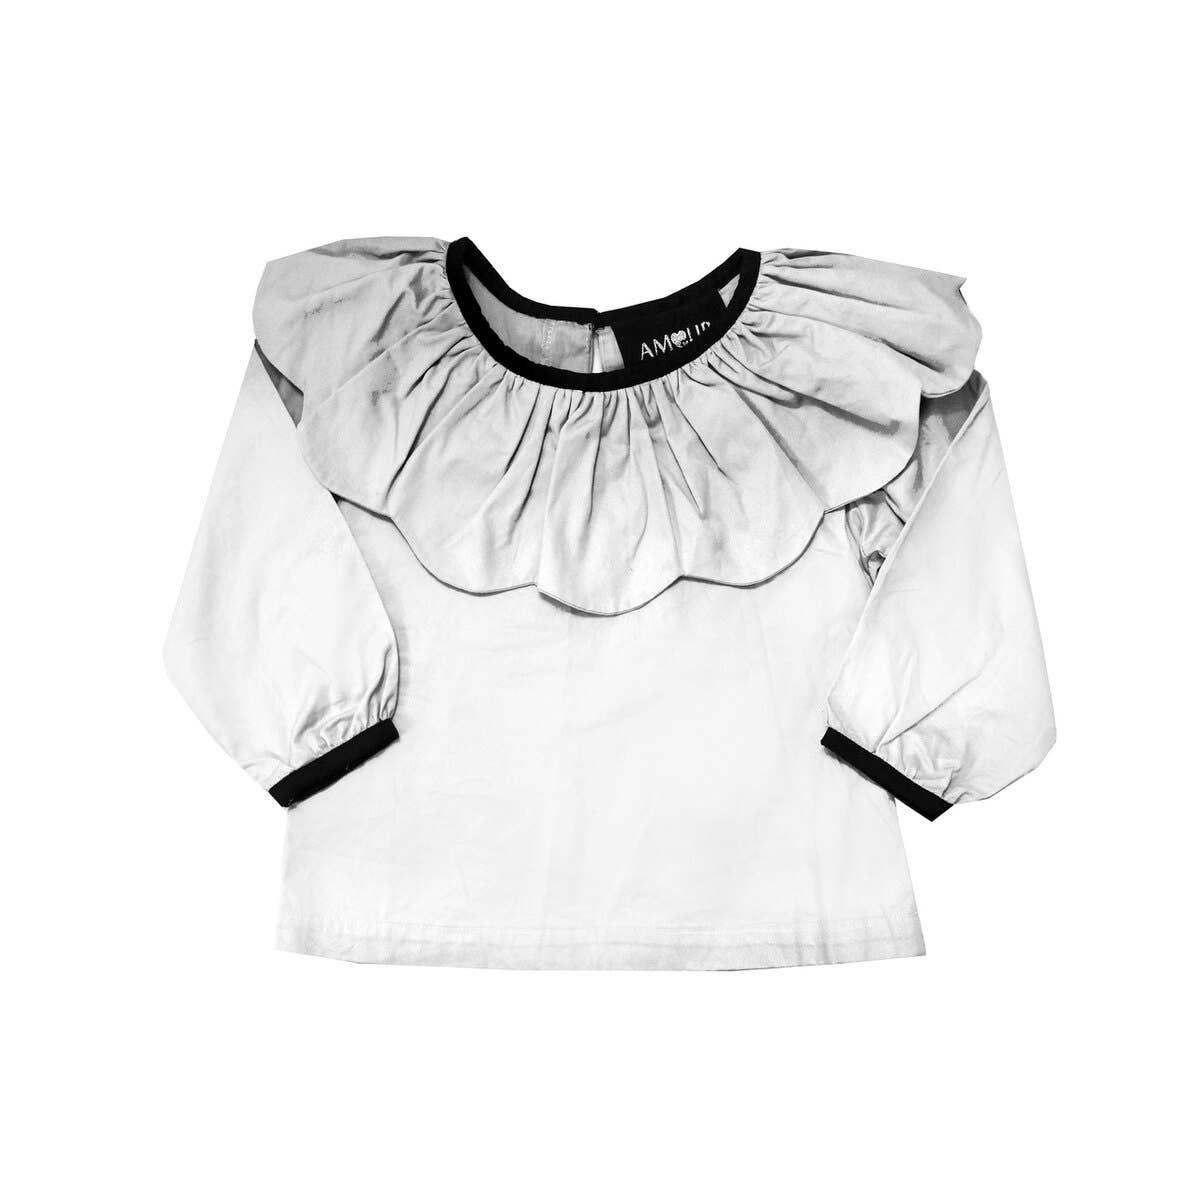 Joker Ruffle Shirt - White | Trada Marketplace